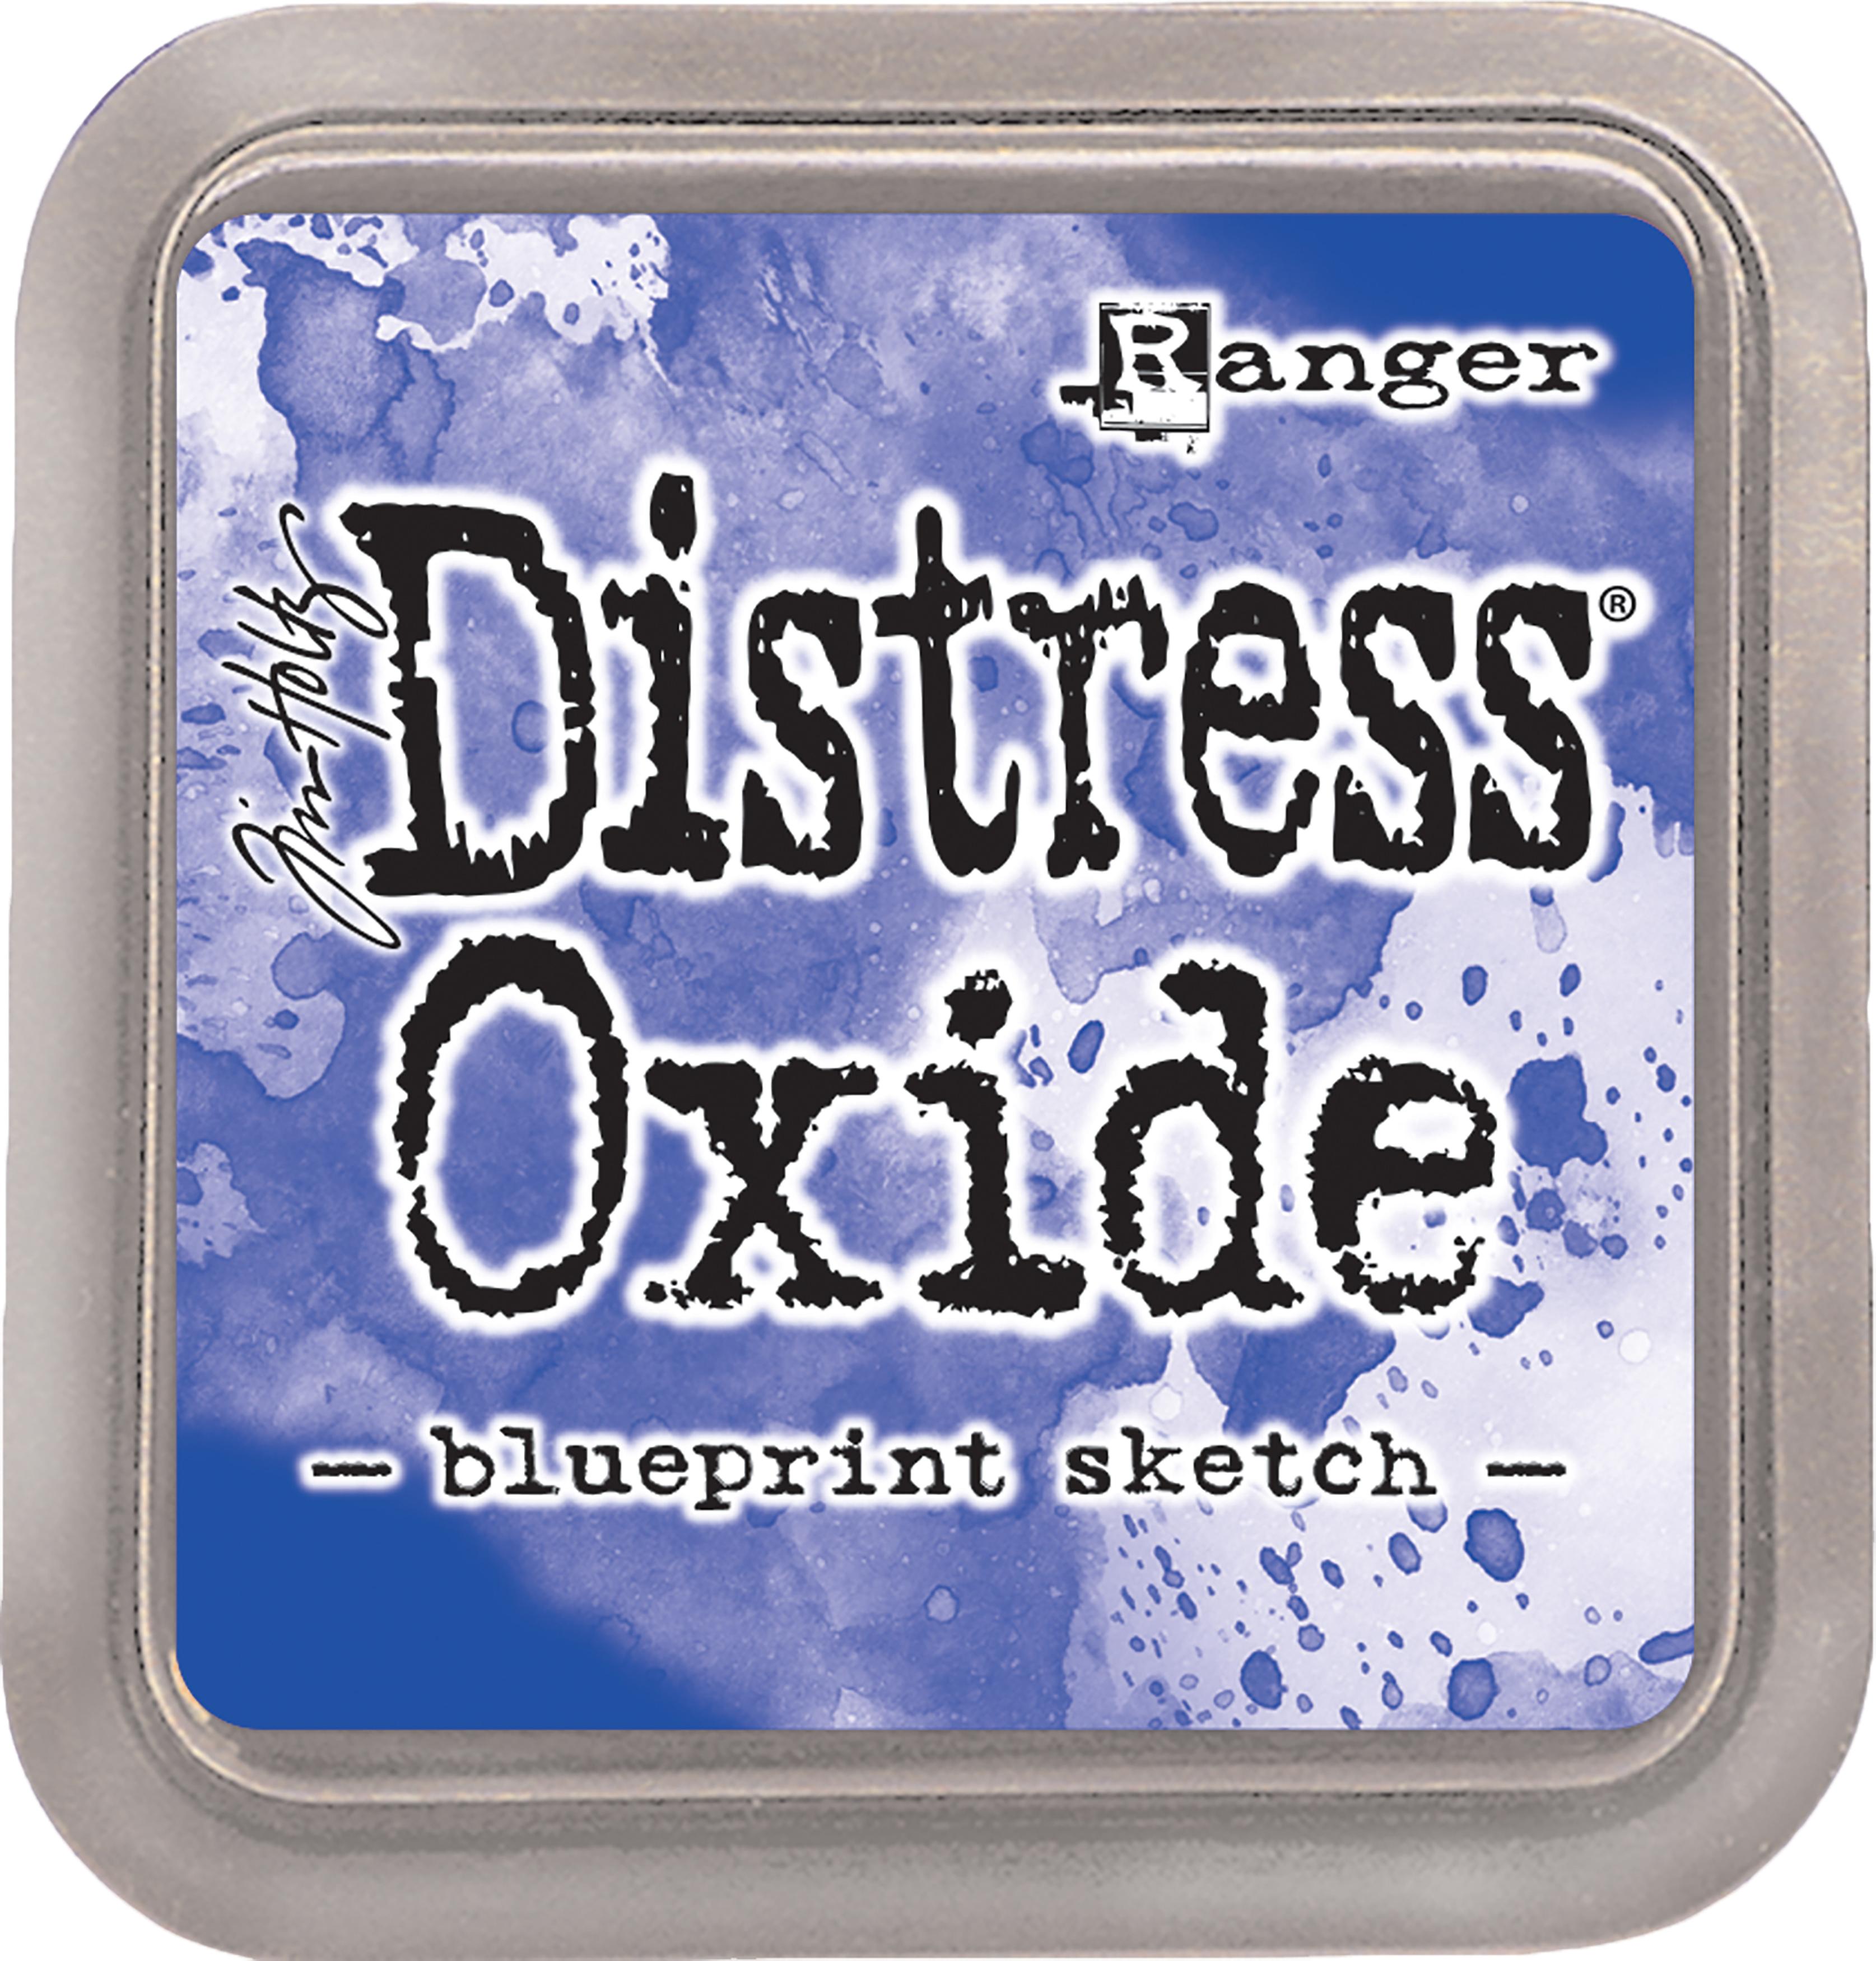 Distress Oxide - Blueprint Ske